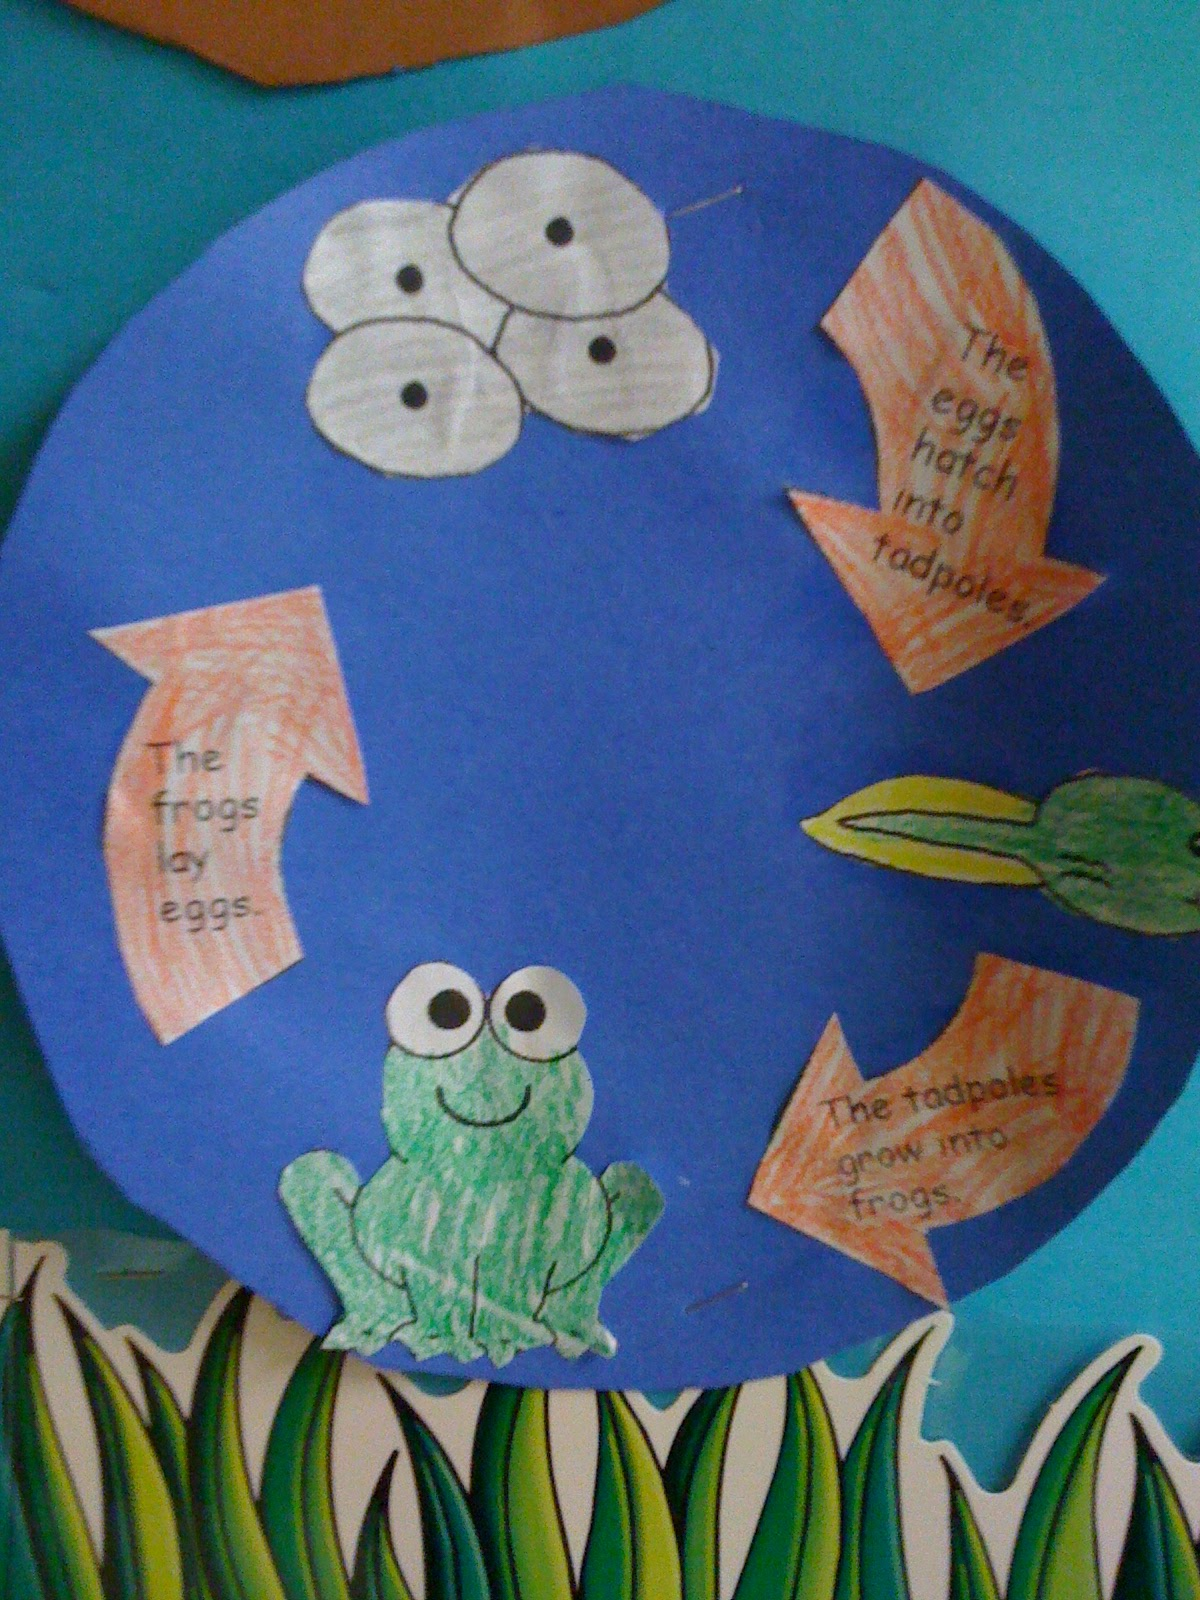 Bishop's Blackboard: An Elementary Education Blog: Frog Facts